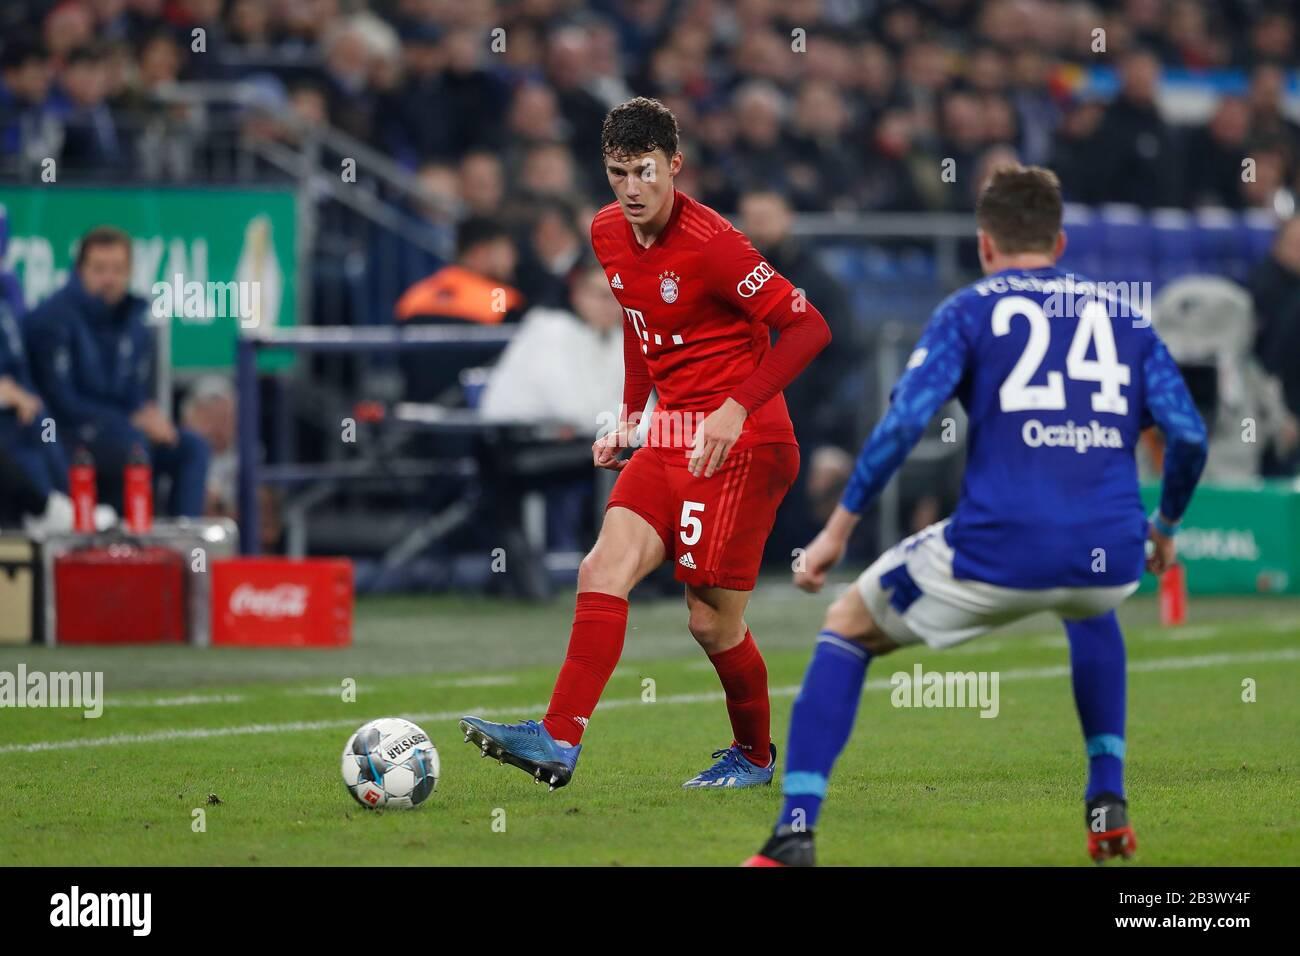 Gelsenkirchen Germany 3rd Mar 2020 Benjamin Pavard Bayern Football Soccer Germany Dfb Pokal Quarter Finals Match